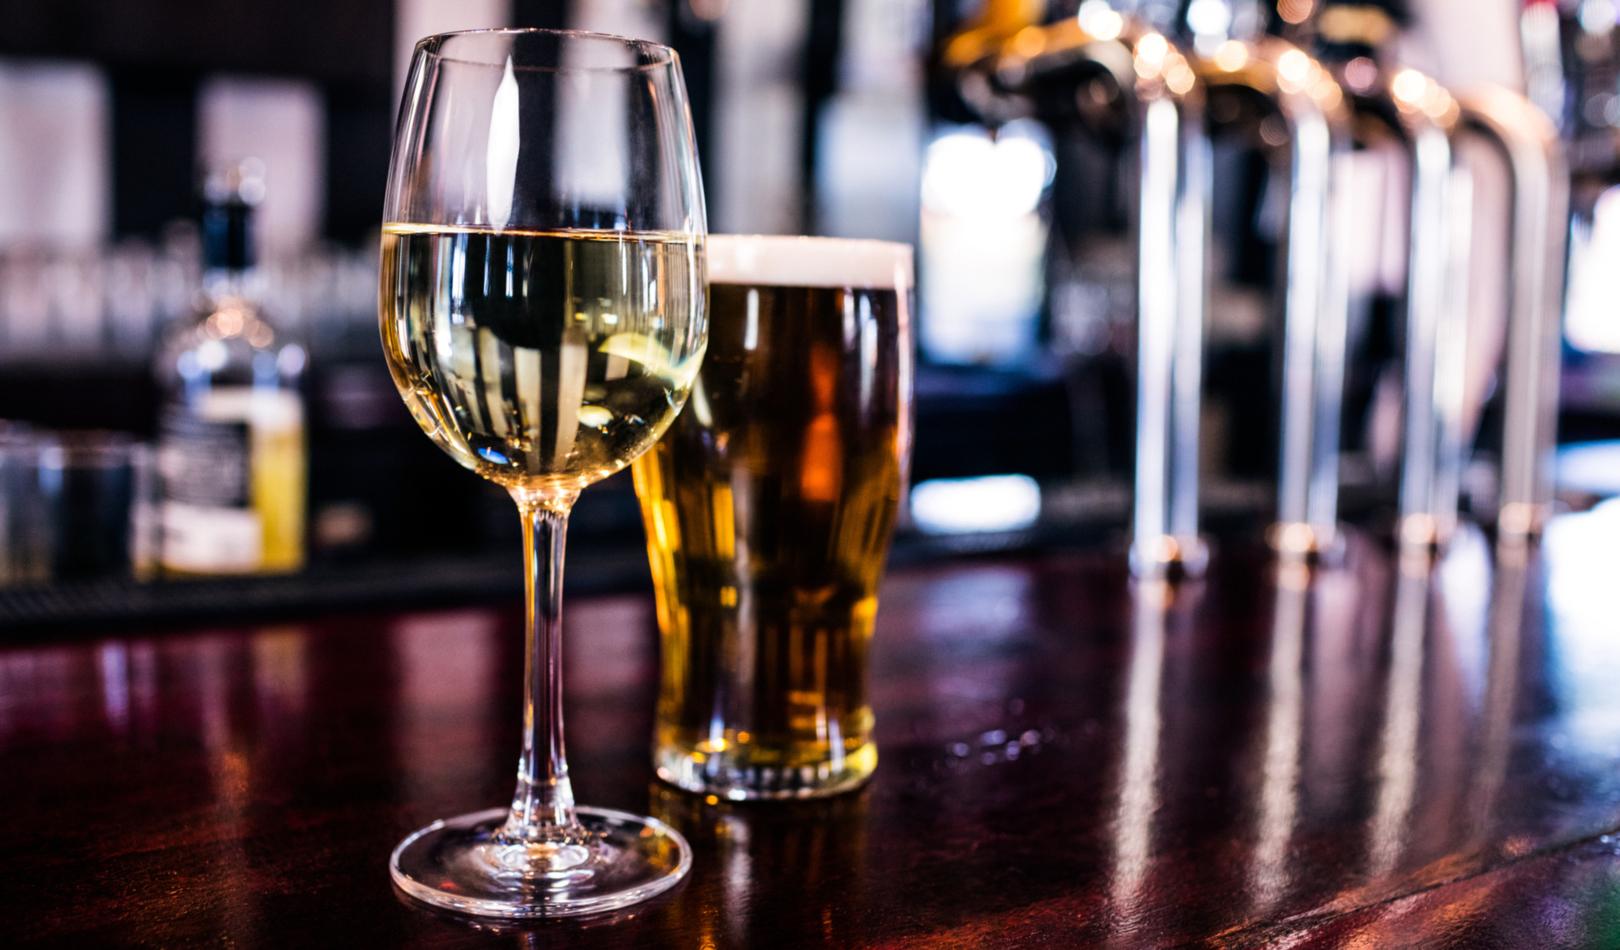 Pub Restuarant in Ludlow - B&B in Ludlow - Rooms & Accommodation in Ludlow